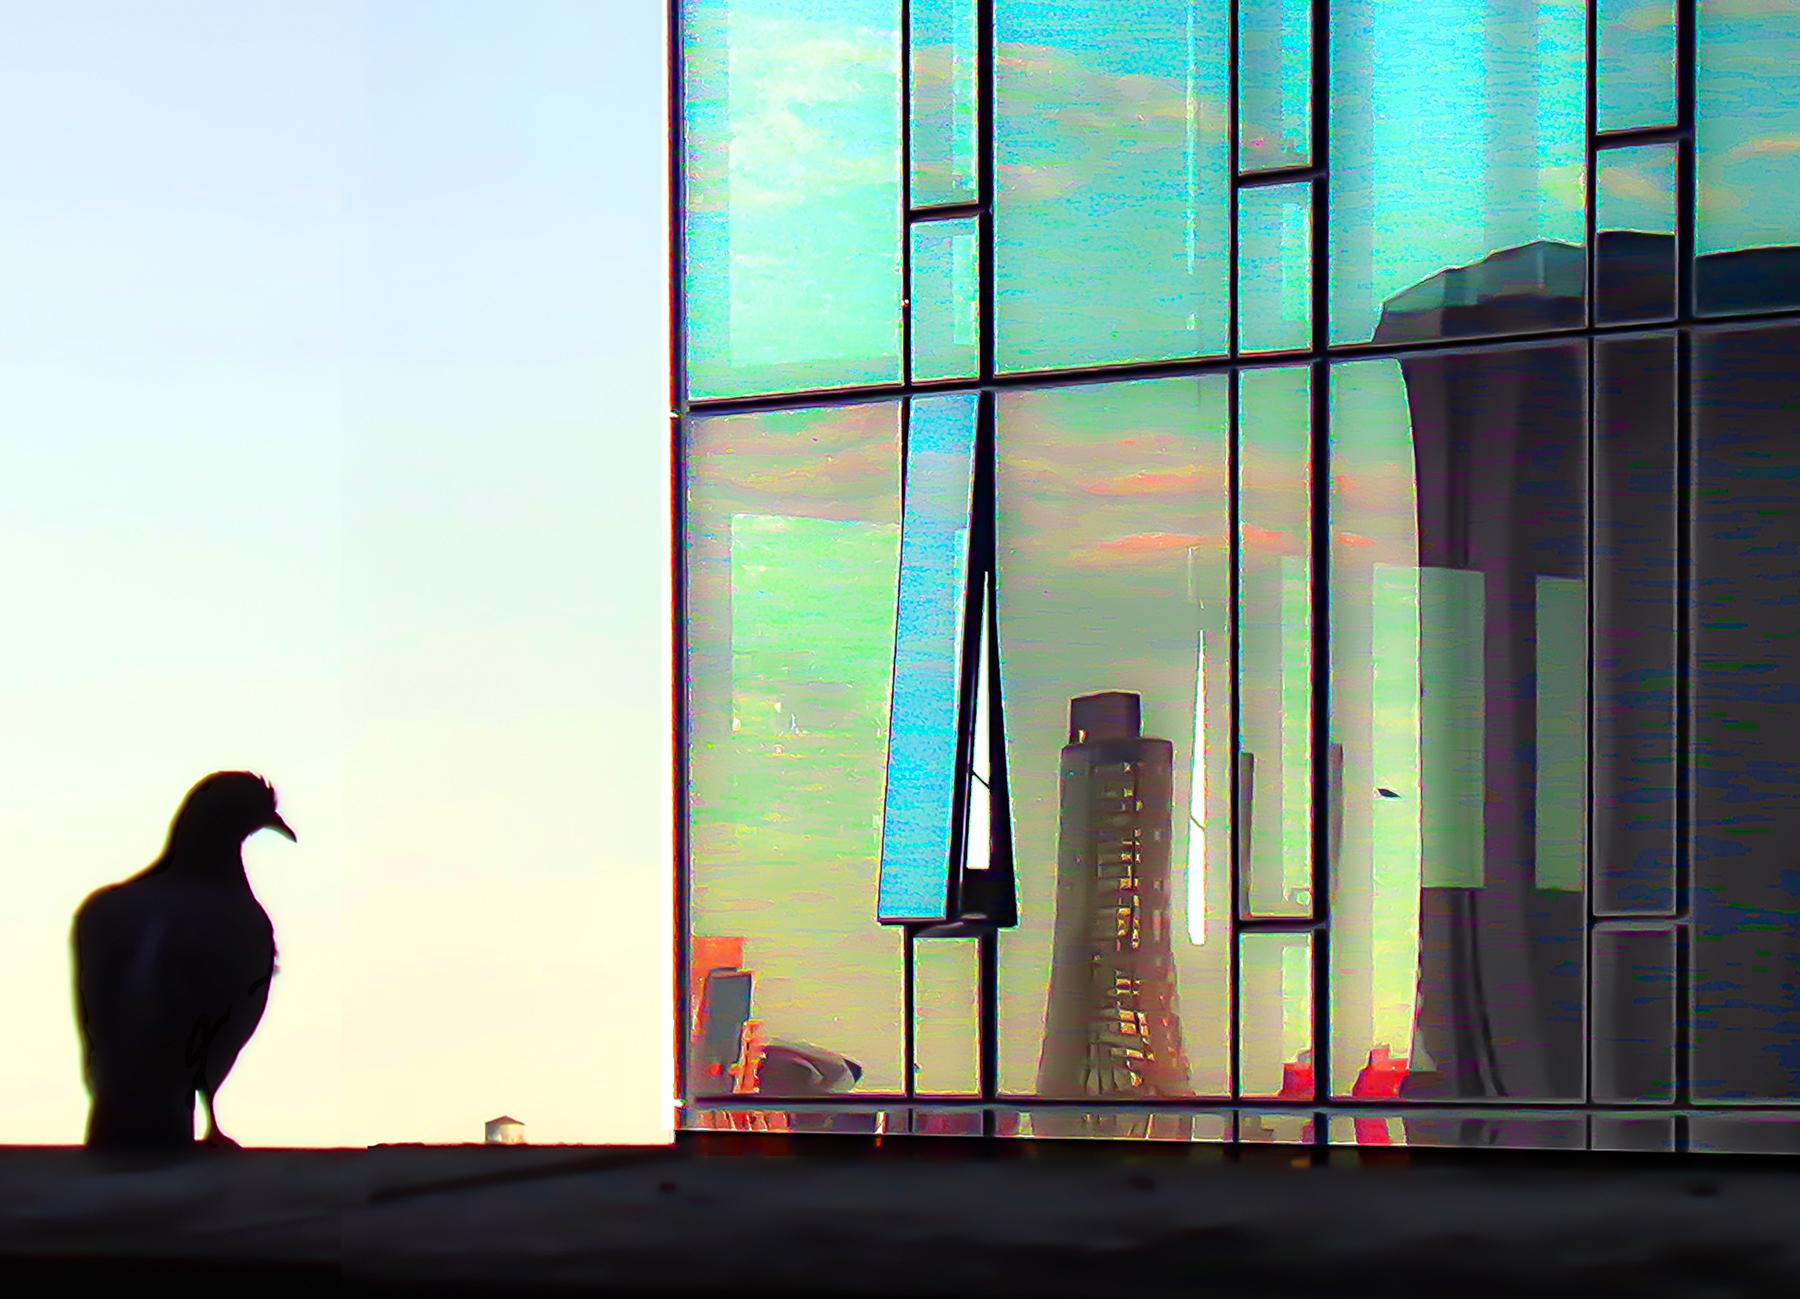 Shifra_Levyathan_Bird and reflection.jpg